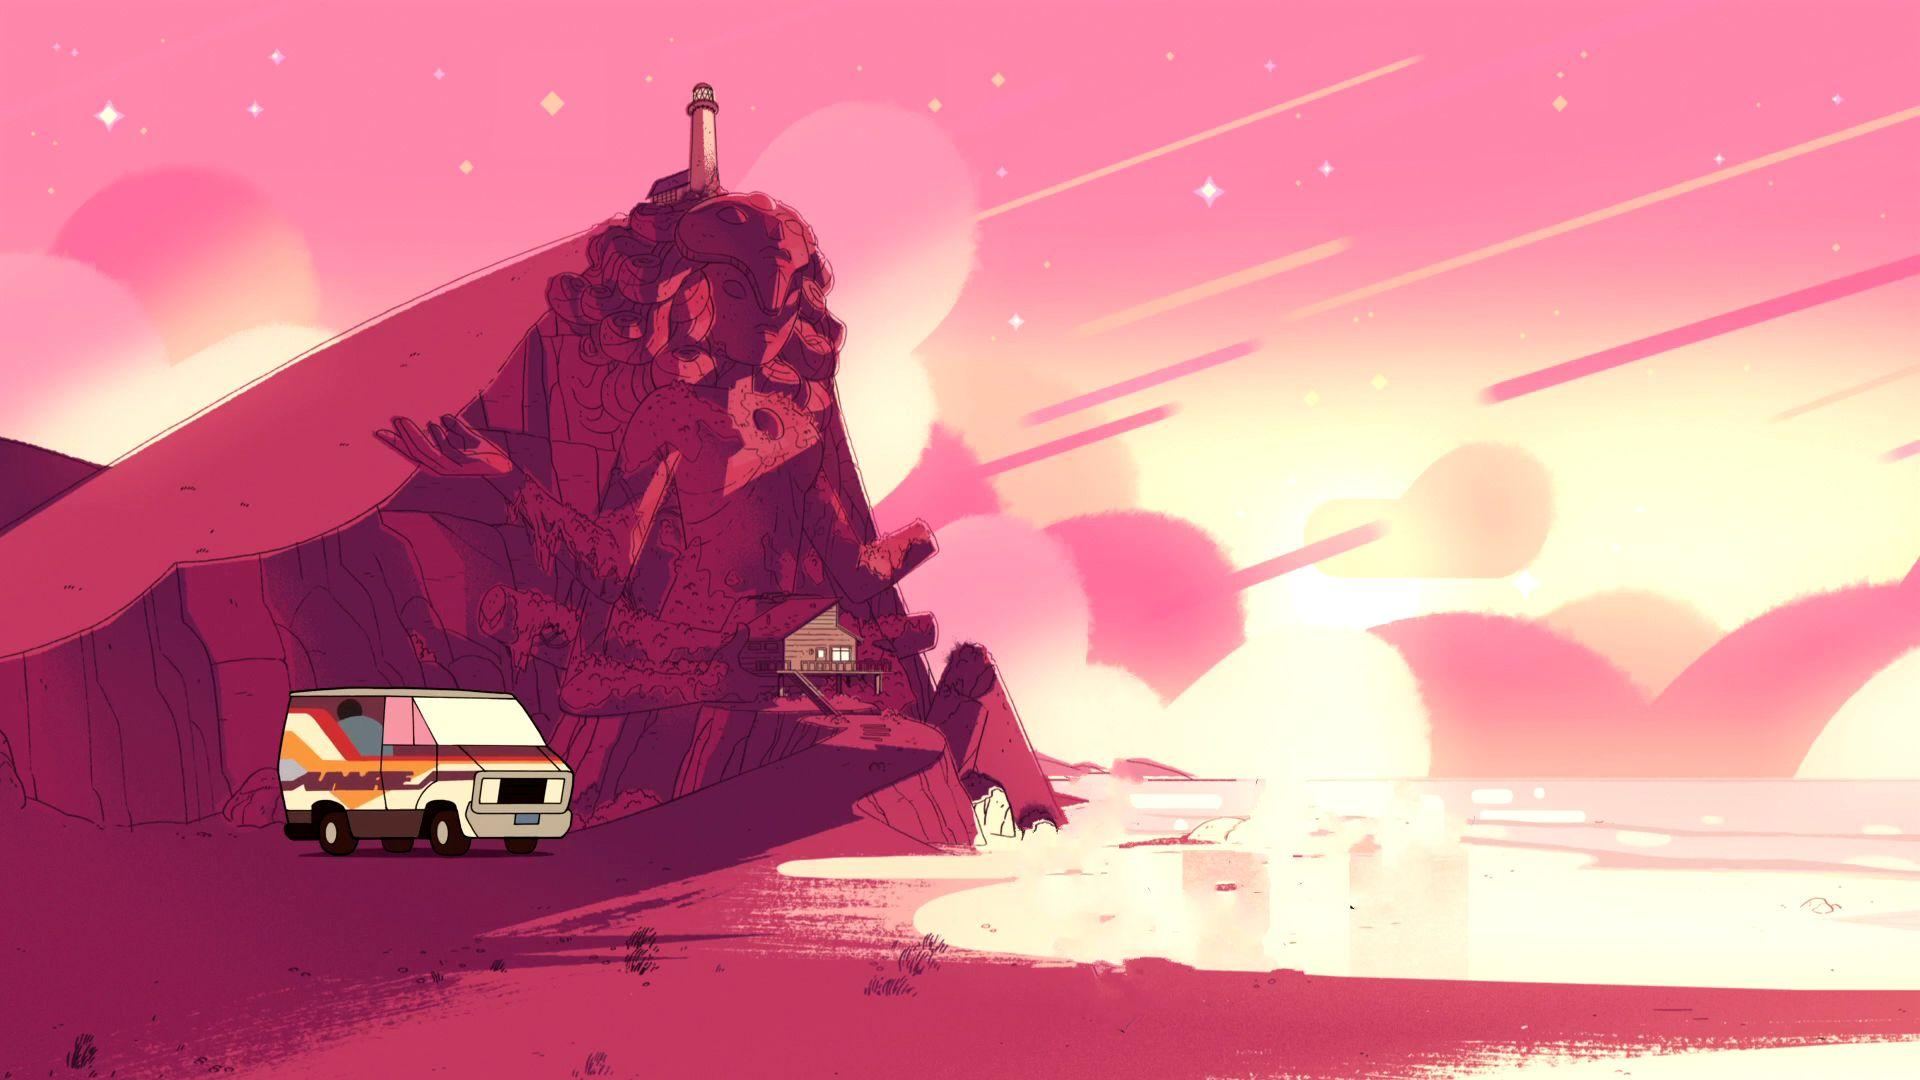 Steven Universe Wallpapers Wallpaper Cave